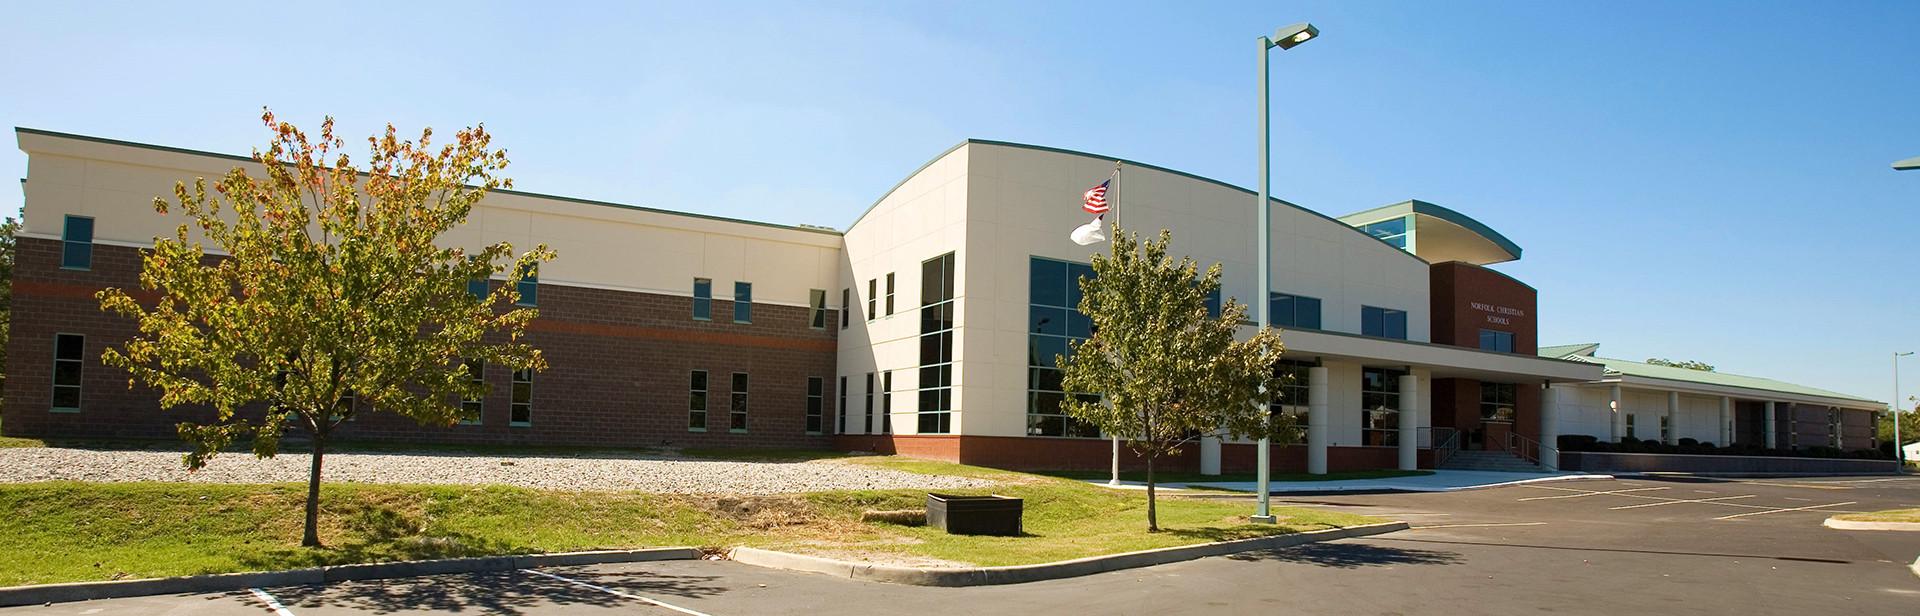 Educatius-NorfolkChristianSchool-USA-Virginia-frontofschool-Banner-2019